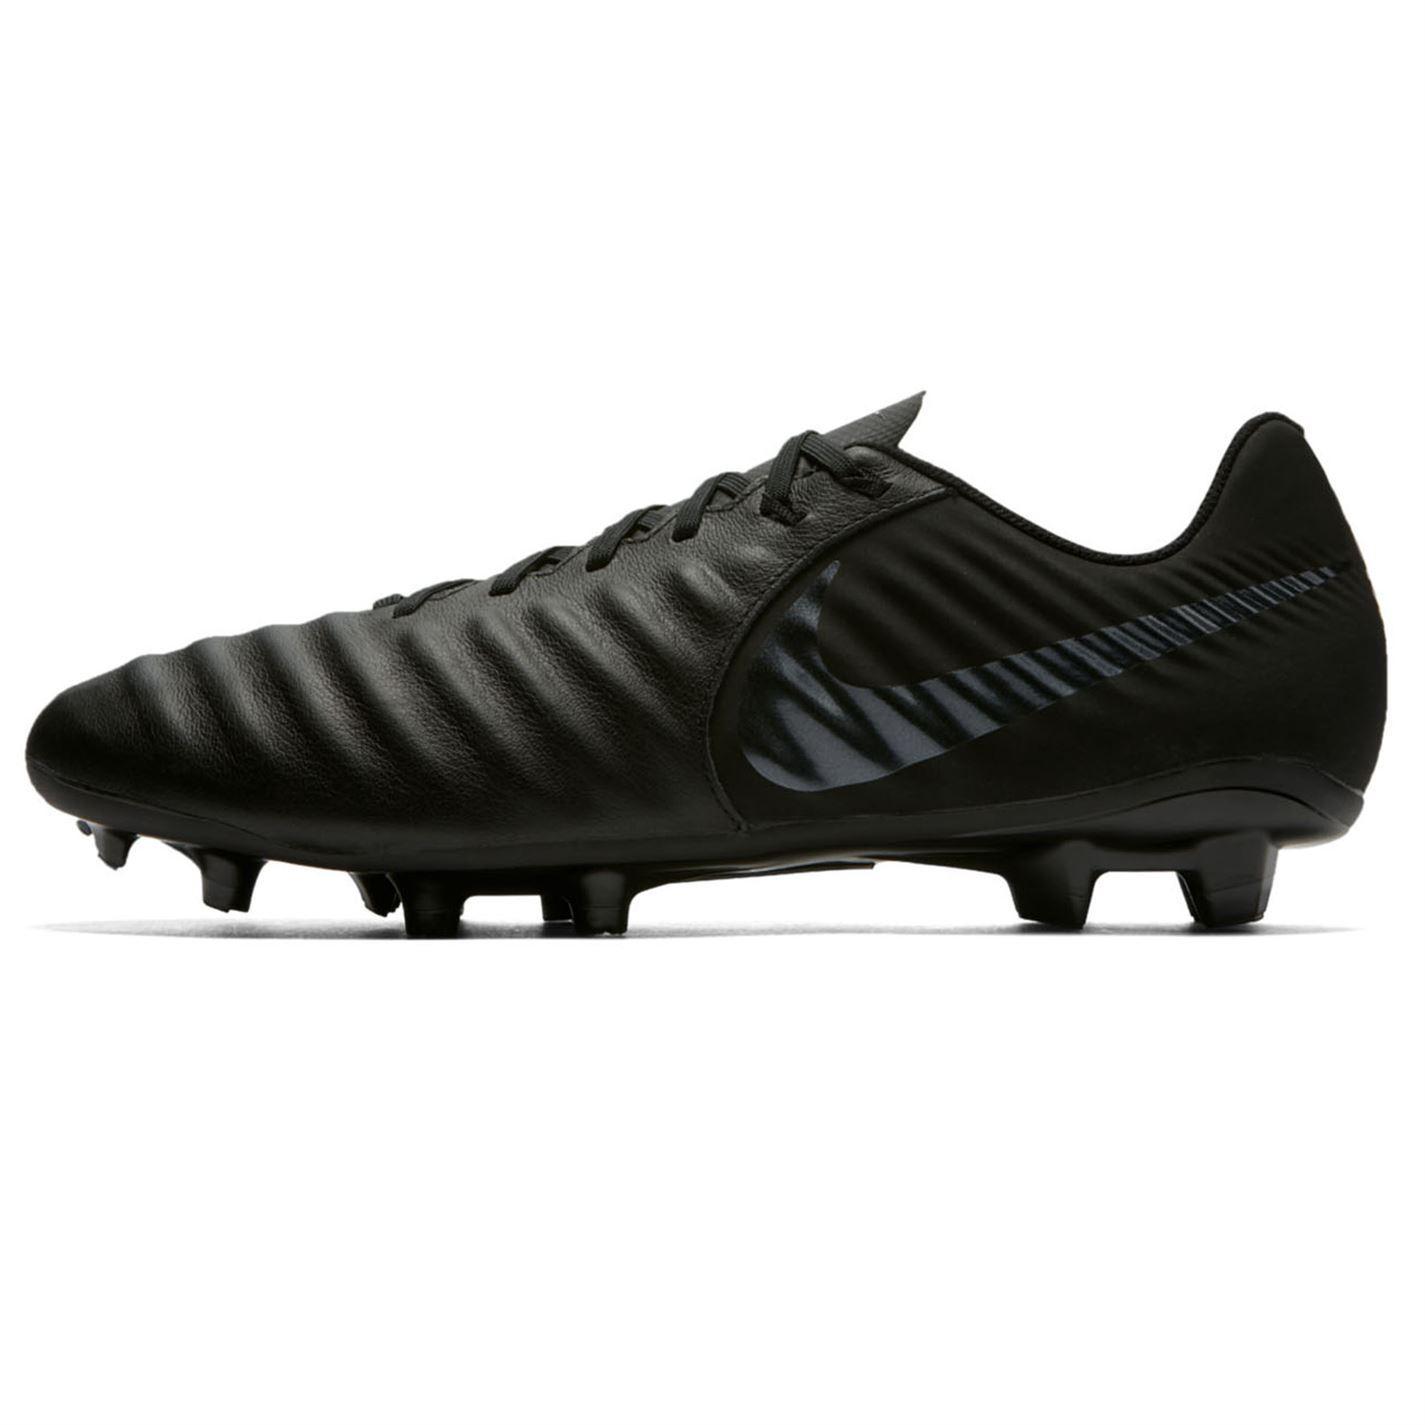 Nike-Tiempo-Legend-Academy-FG-Firm-Ground-Chaussures-De-Football-Homme-Football-Chaussures-Crampons miniature 3